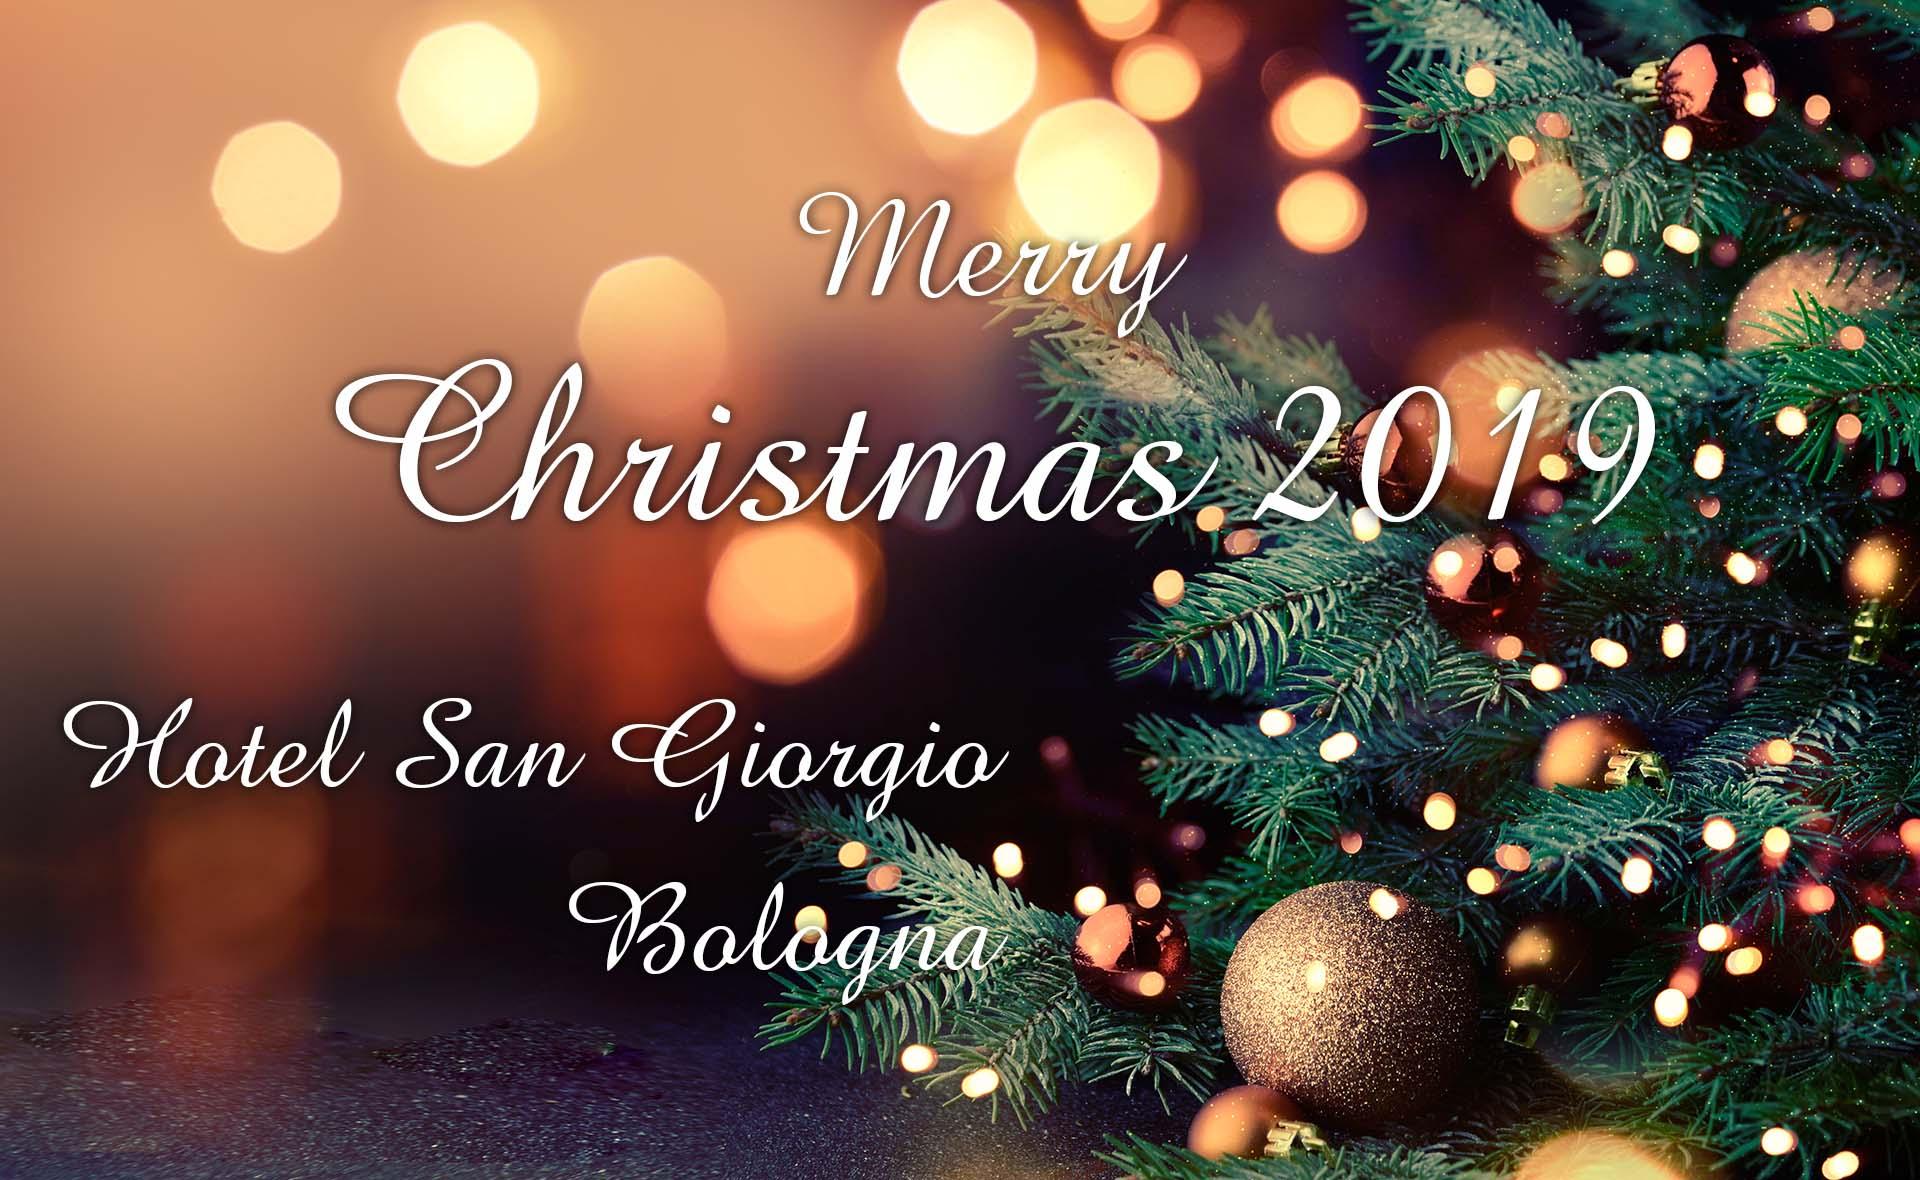 Offerta natale 2019 a Bologna - Hotel San Giorgio a Bologna